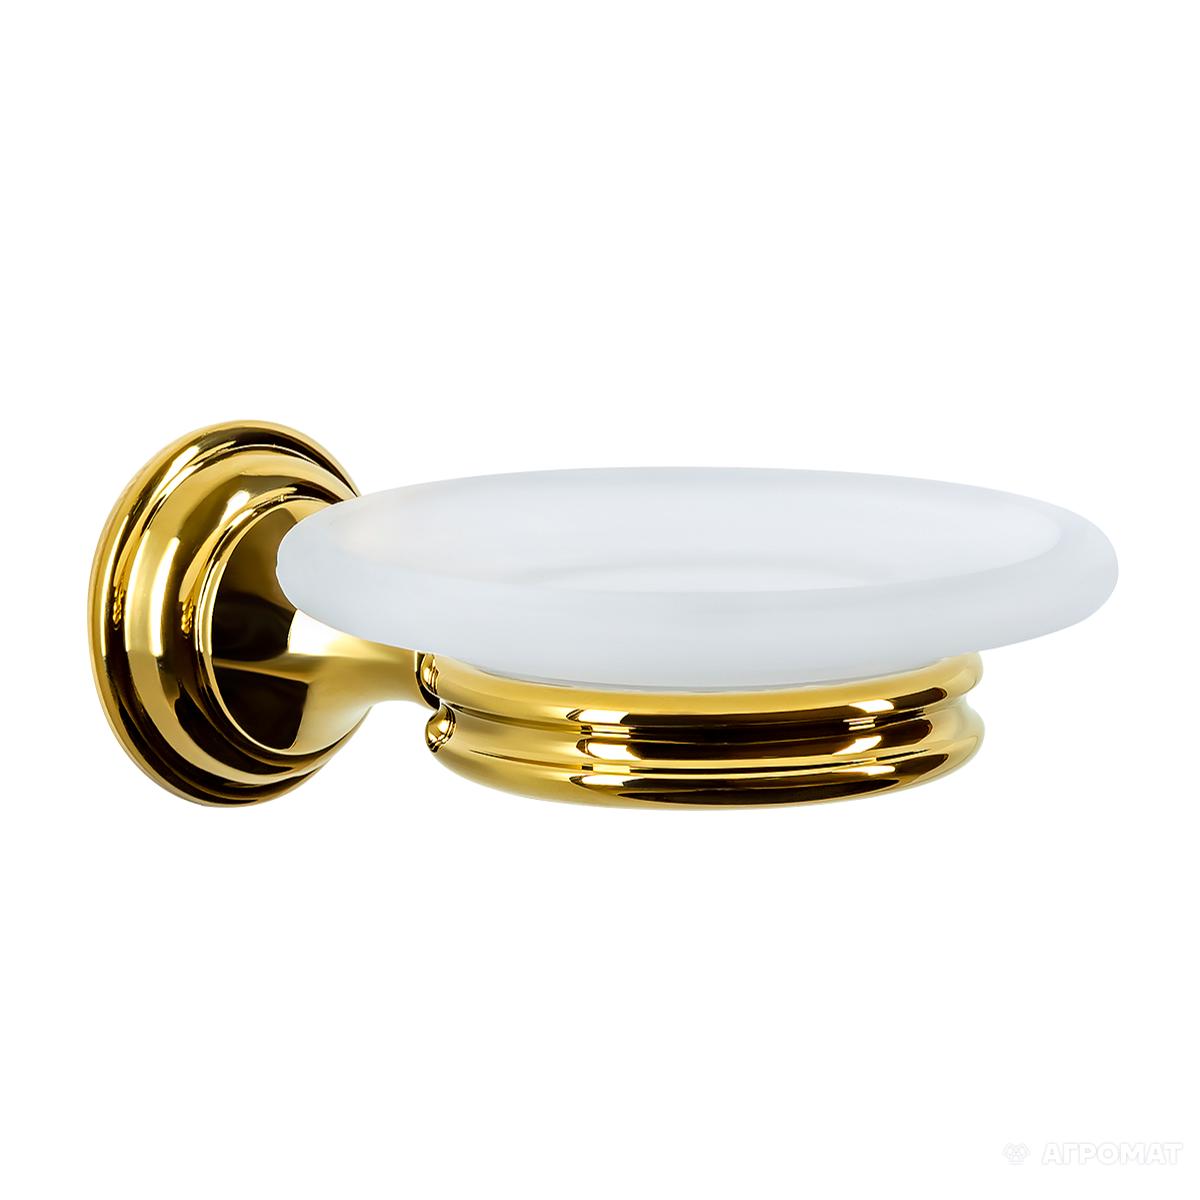 Мыльница Langberger Classic Gold 2112215B-PVDG- , золото